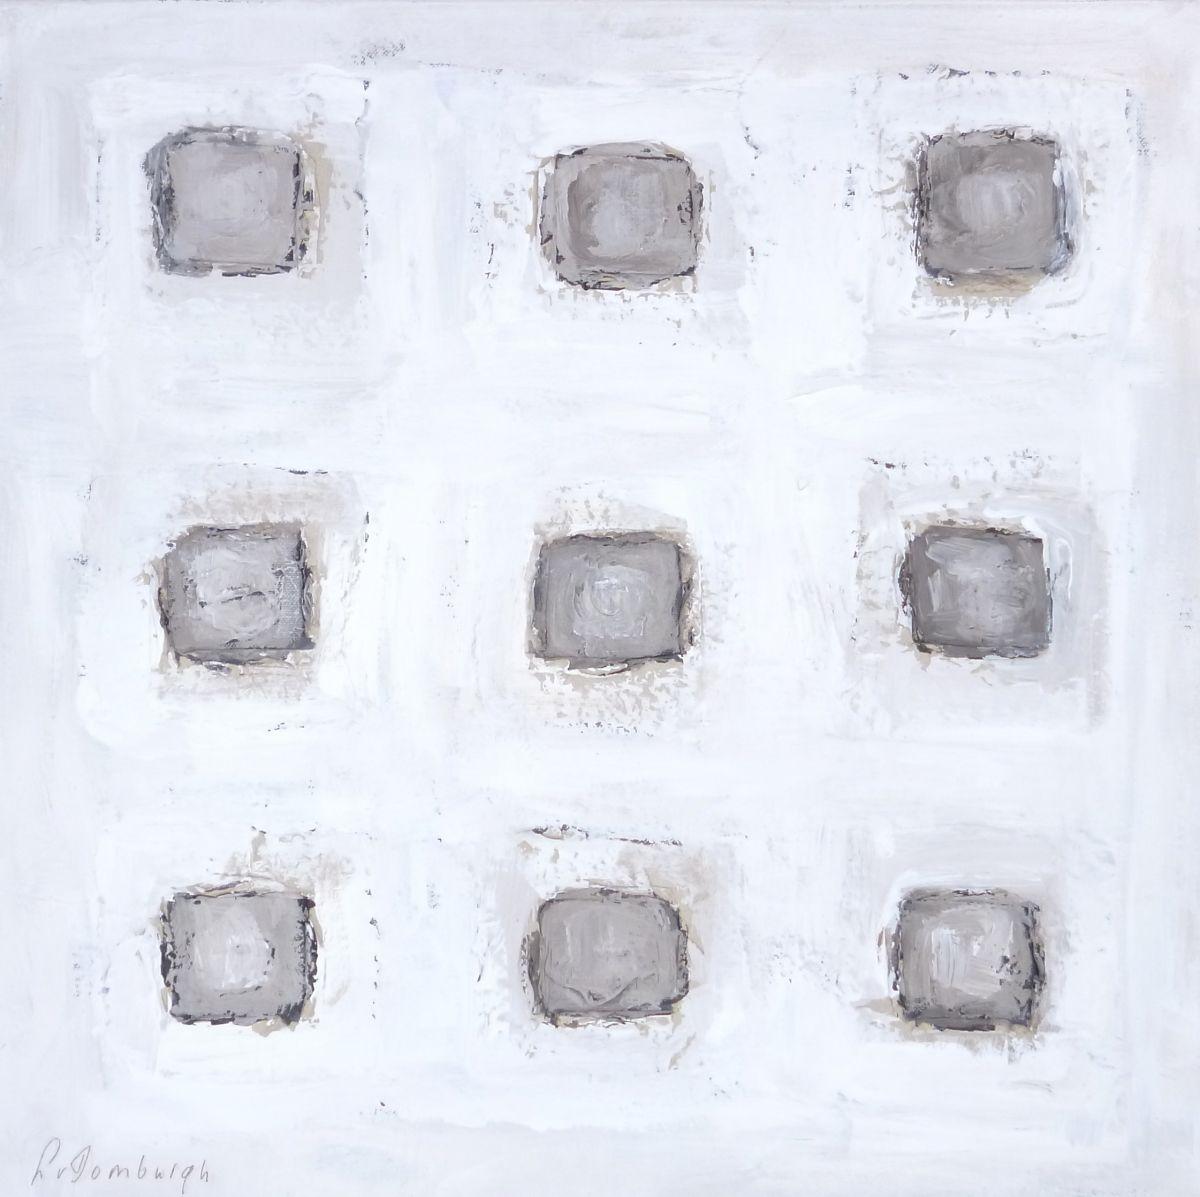 Kunst: domburgh 2 van kunstenaar Lydia van Domburgh